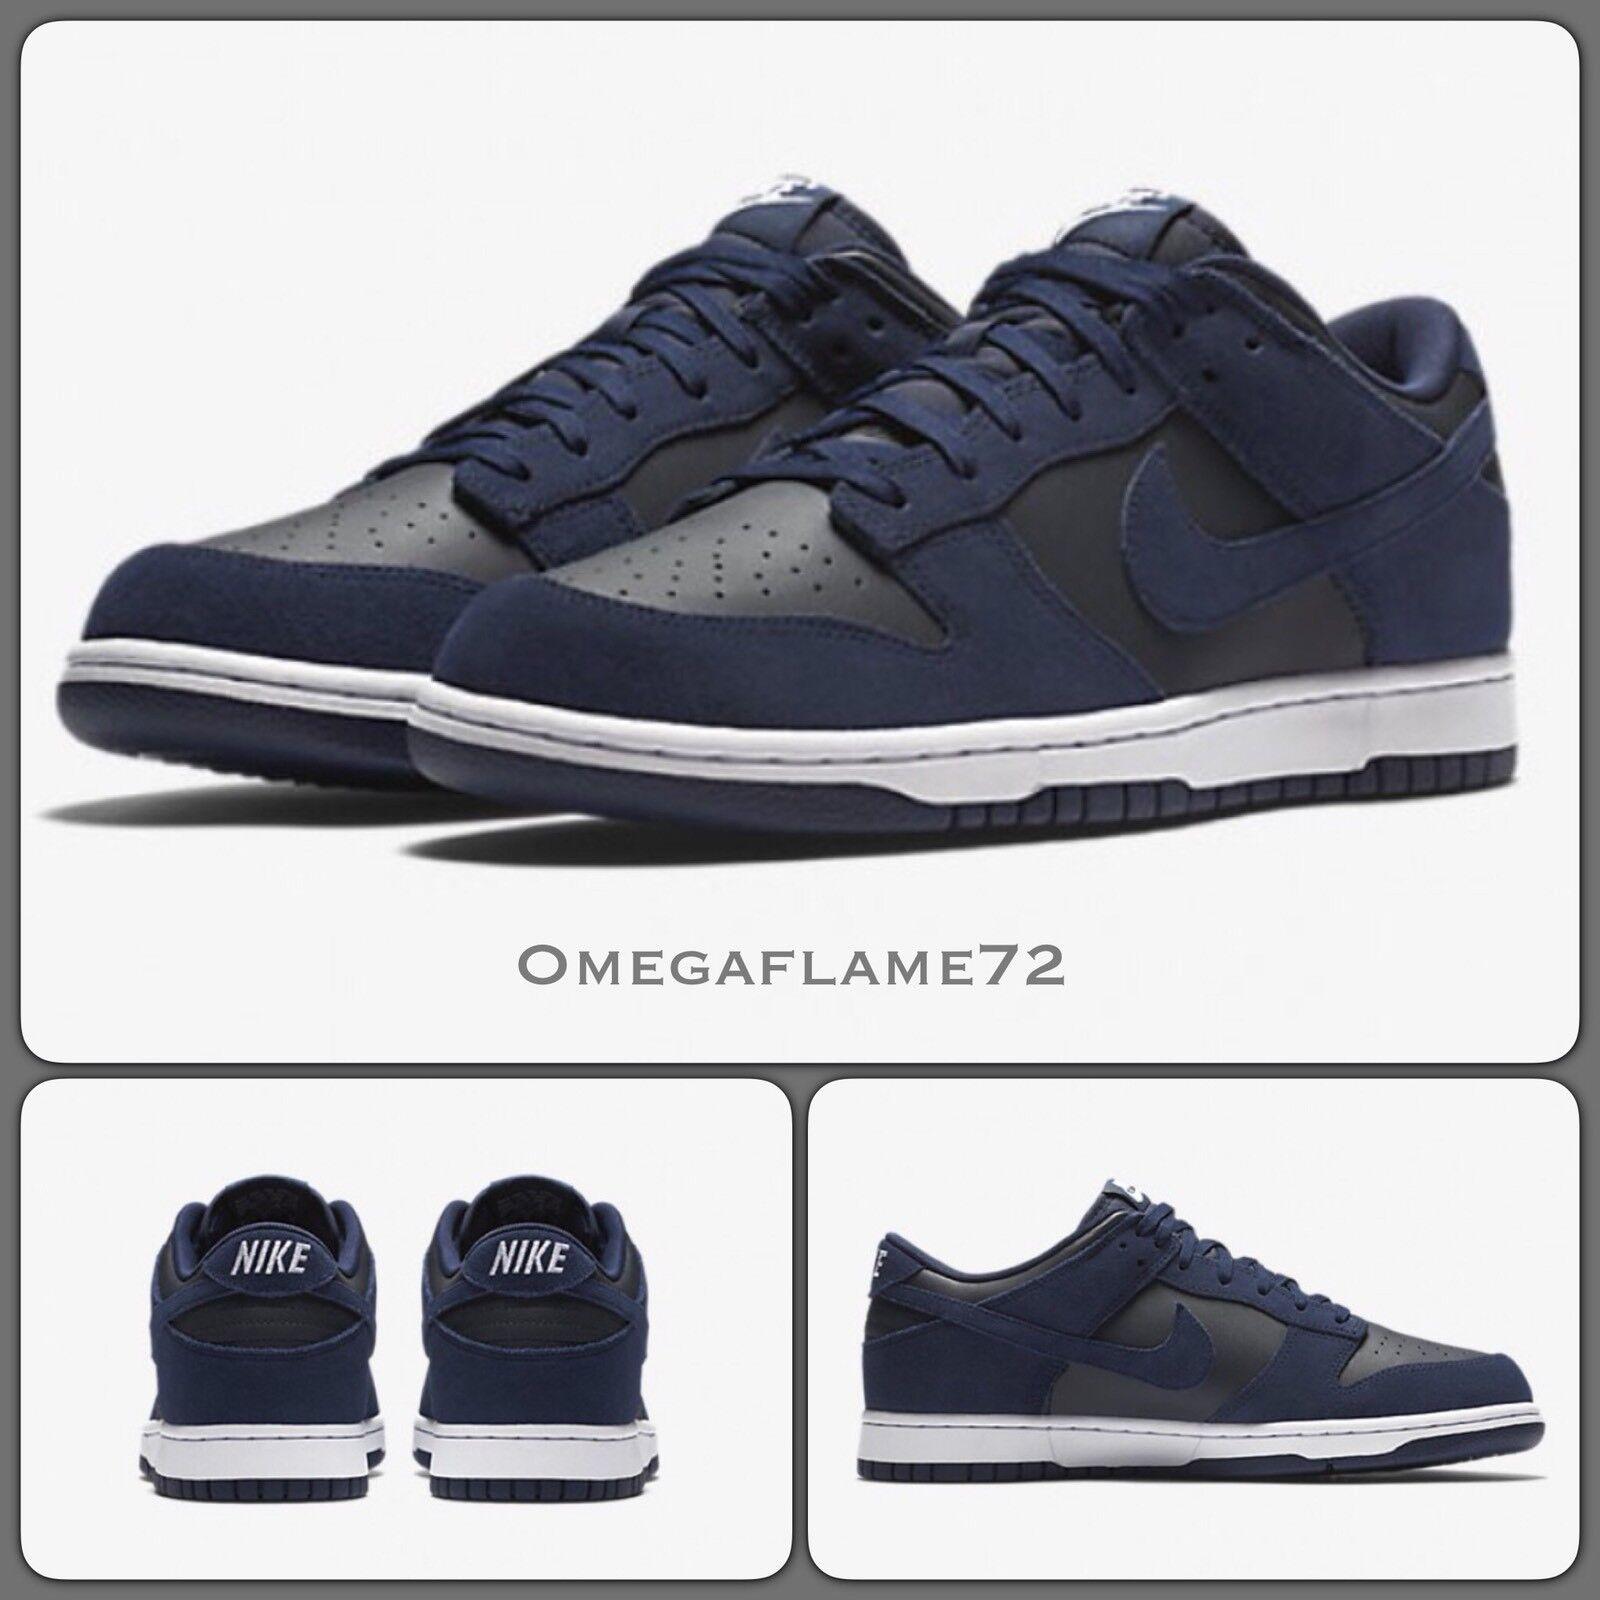 Nike Dunk Low, Mens Obsidian & Black, 904234-401 Mens Low, US 14 116c28